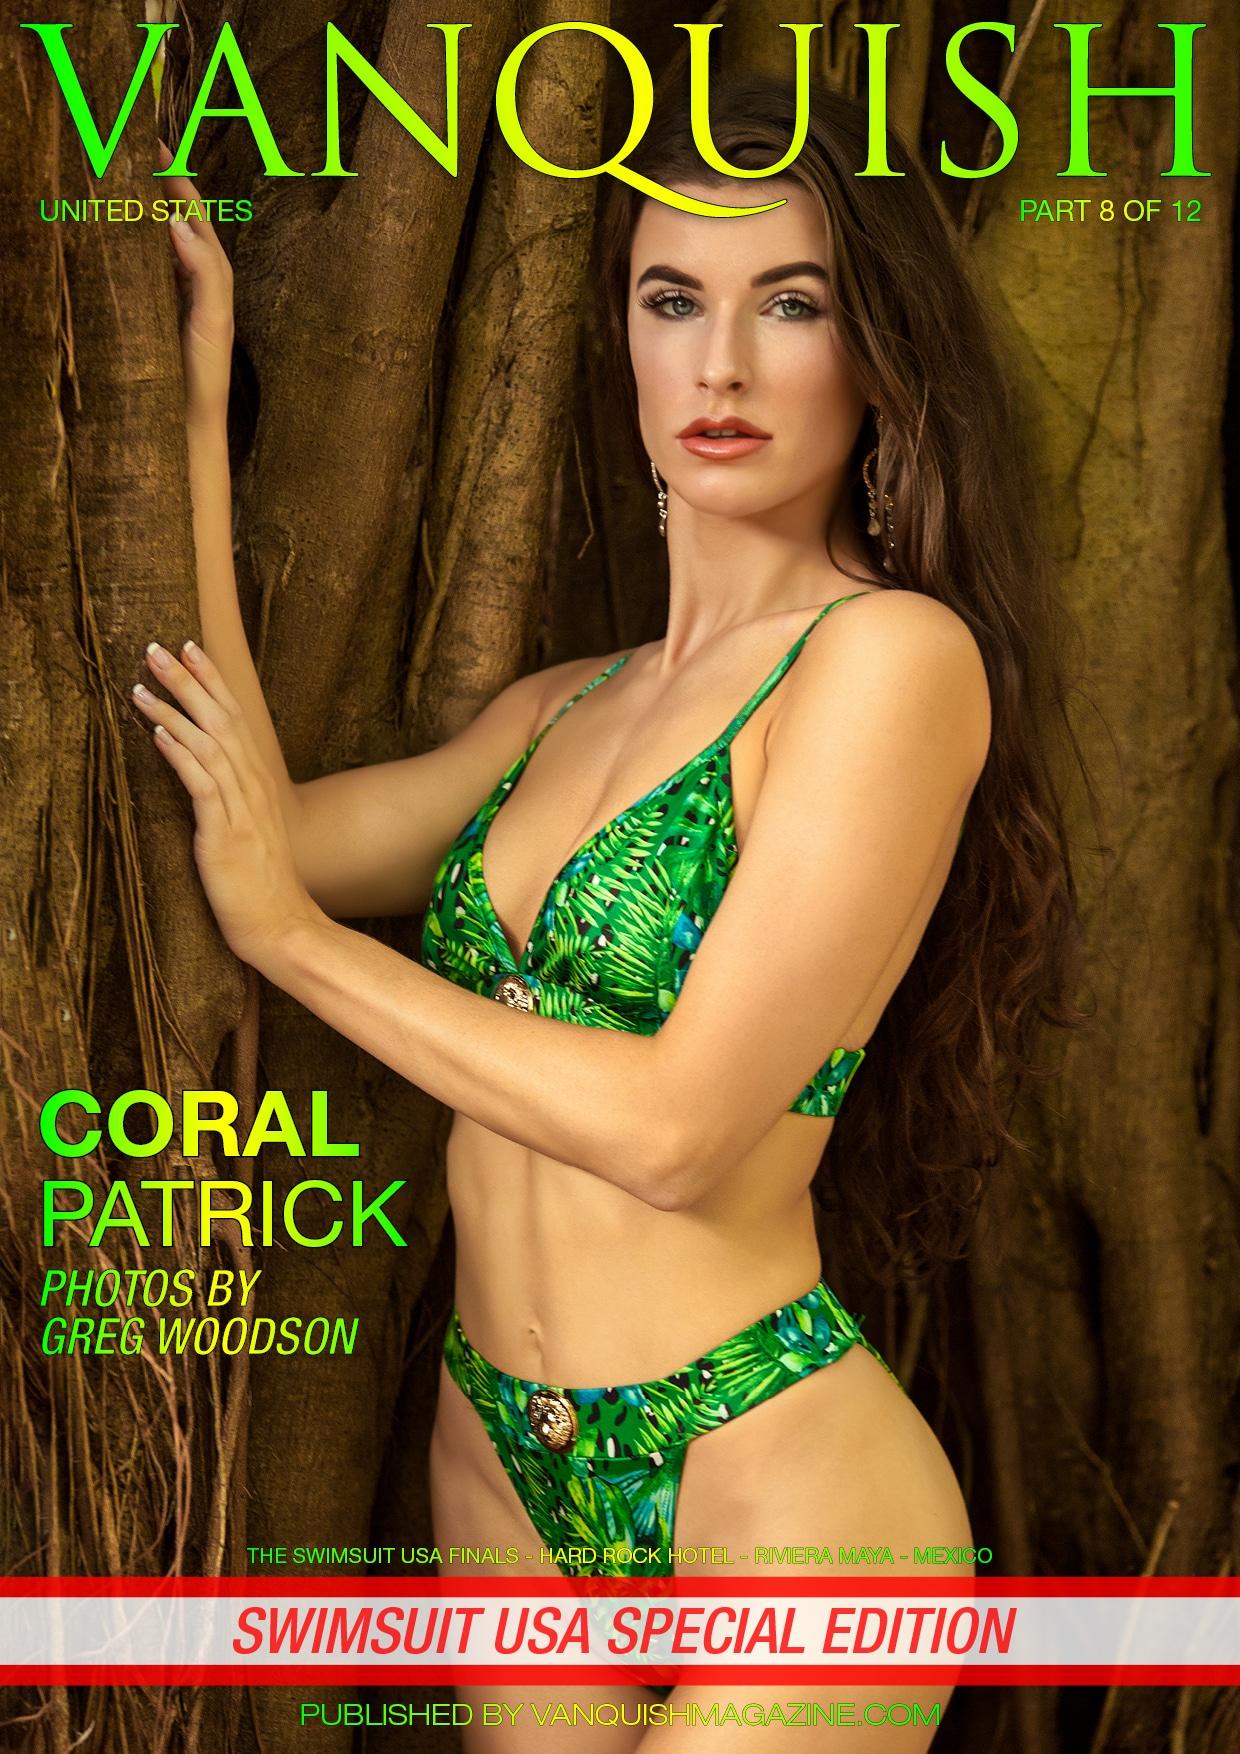 Vanquish Magazine - Swimsuit USA 2018 - Part 8 - Coral Patrick 1